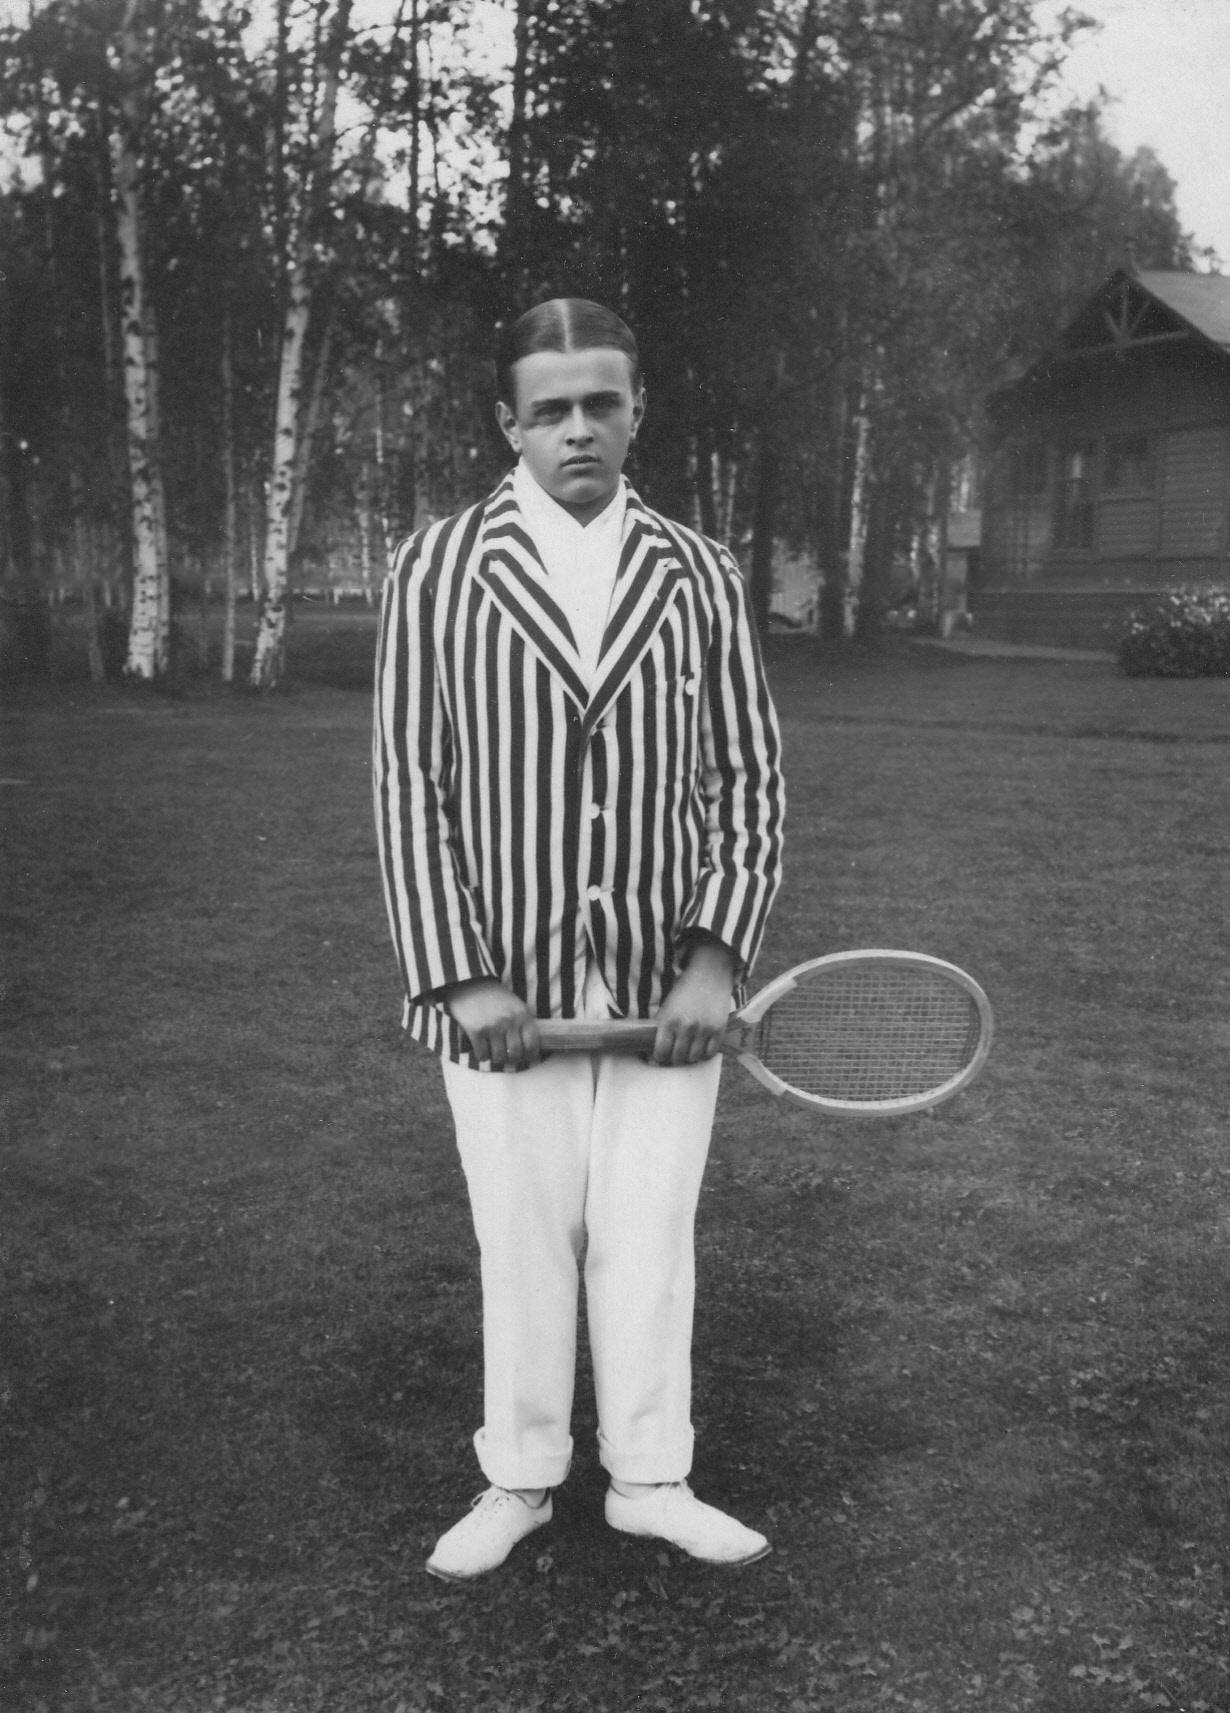 11. Сын А. Д. Макферсона - Роберт Артурович Макферсон III с теннисной ракеткой